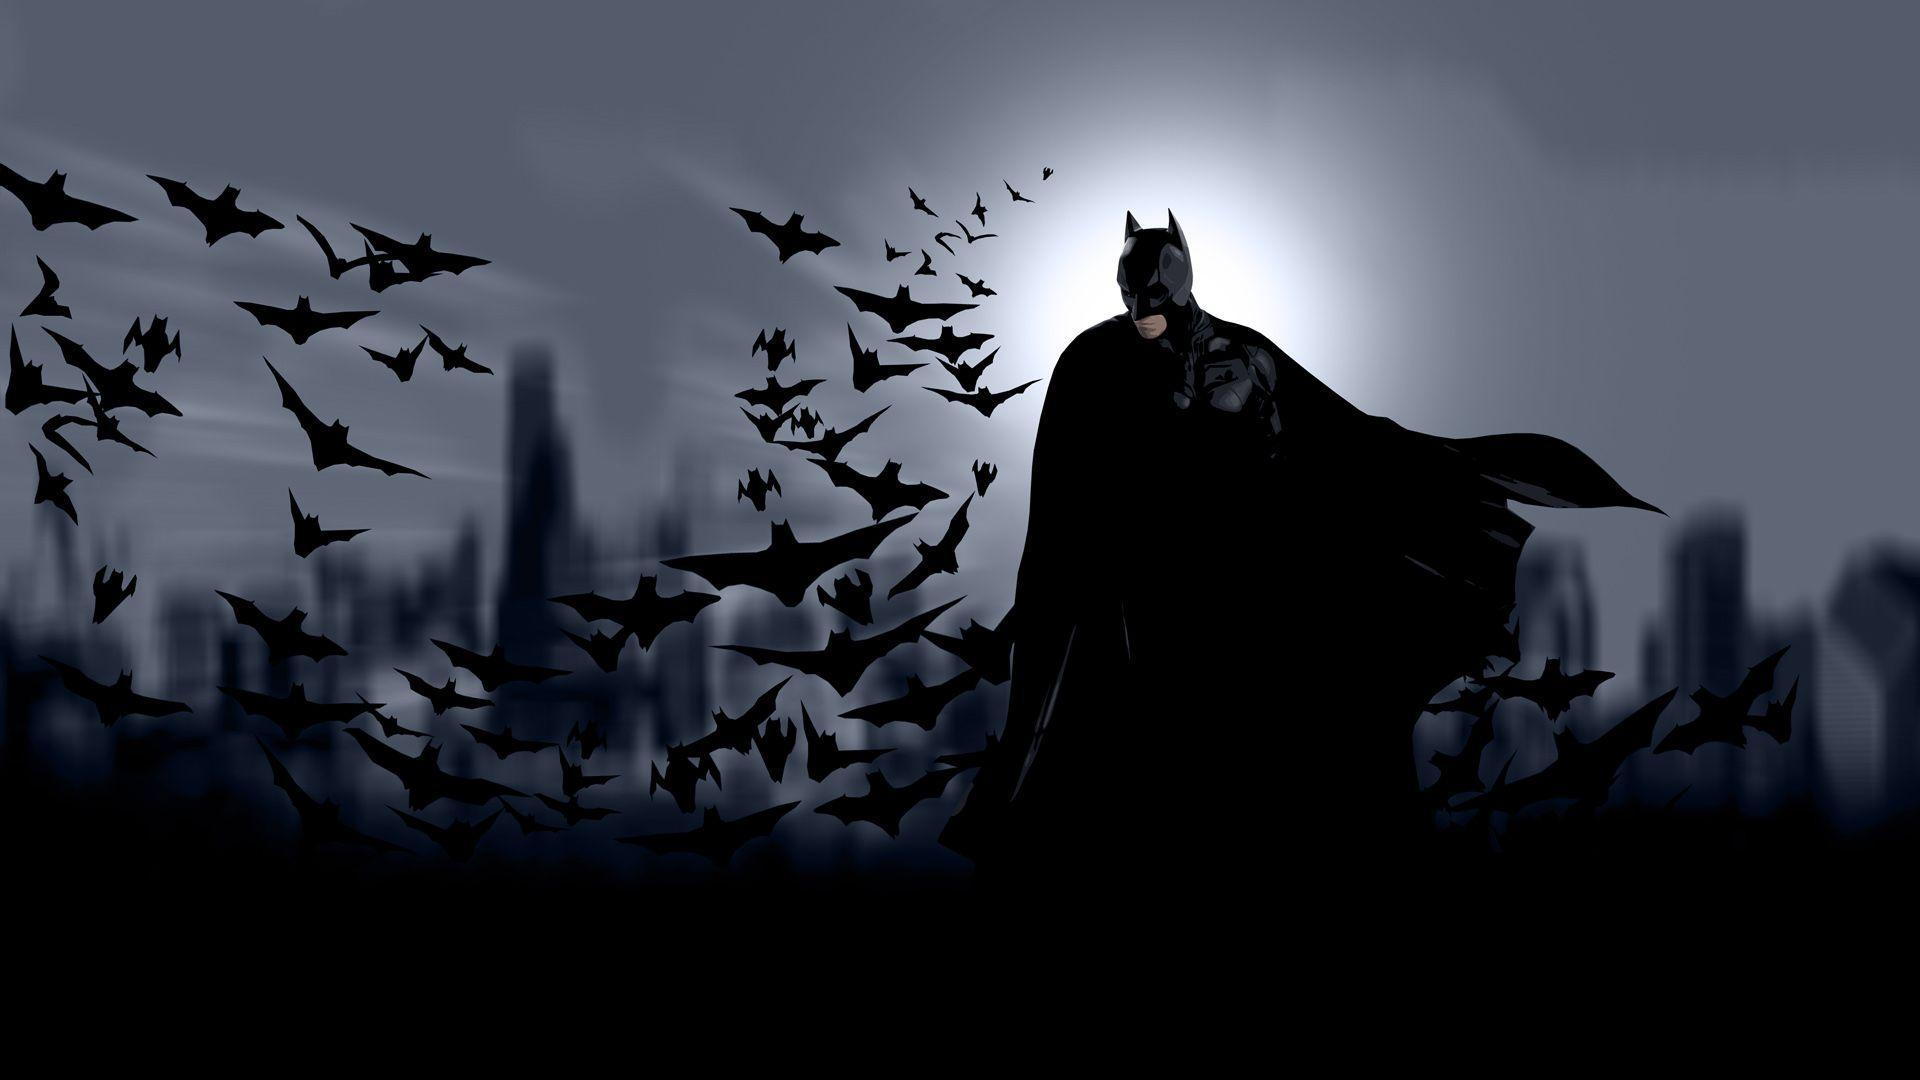 HD Batman Wallpapers